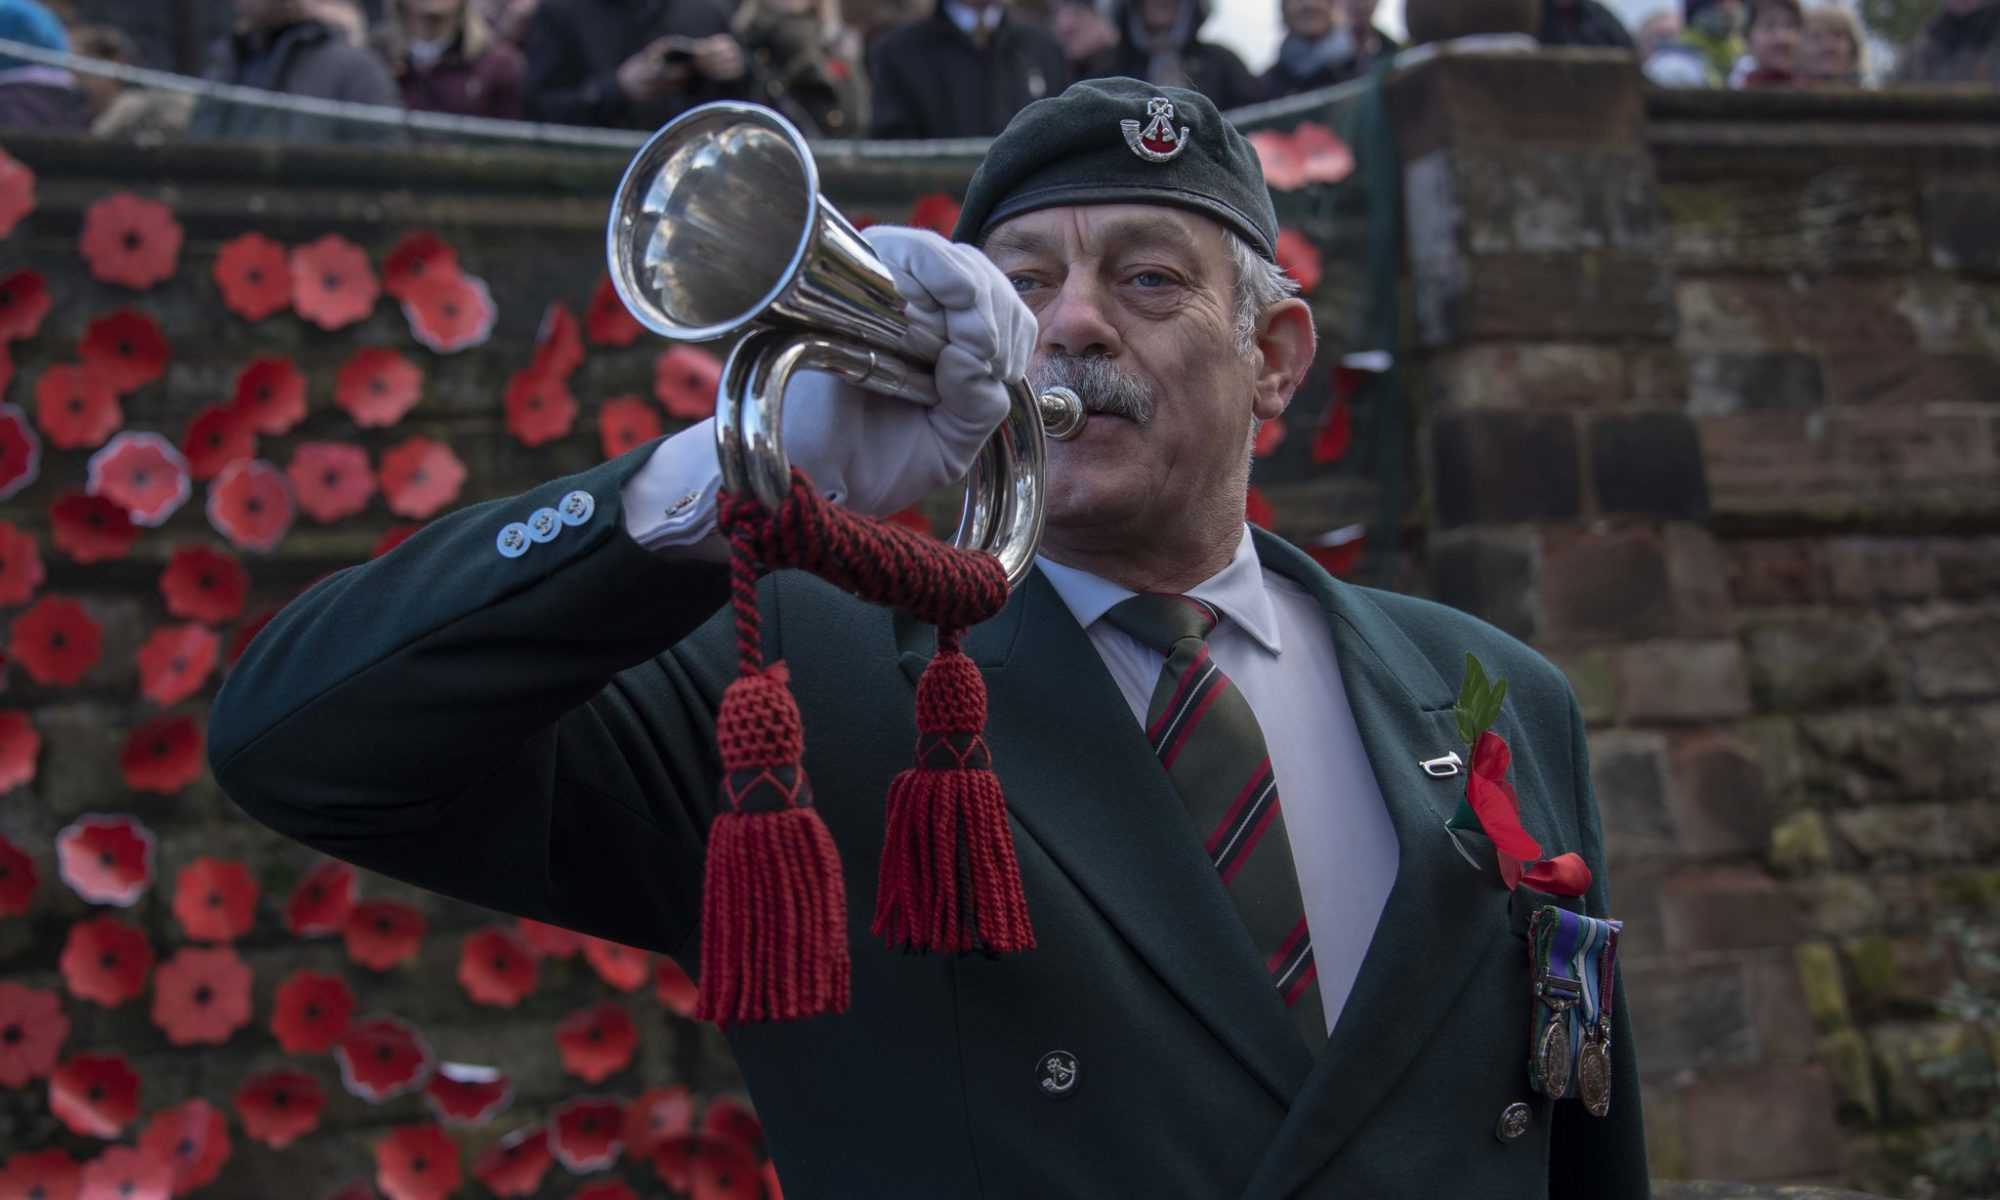 Tettenhall Remembers